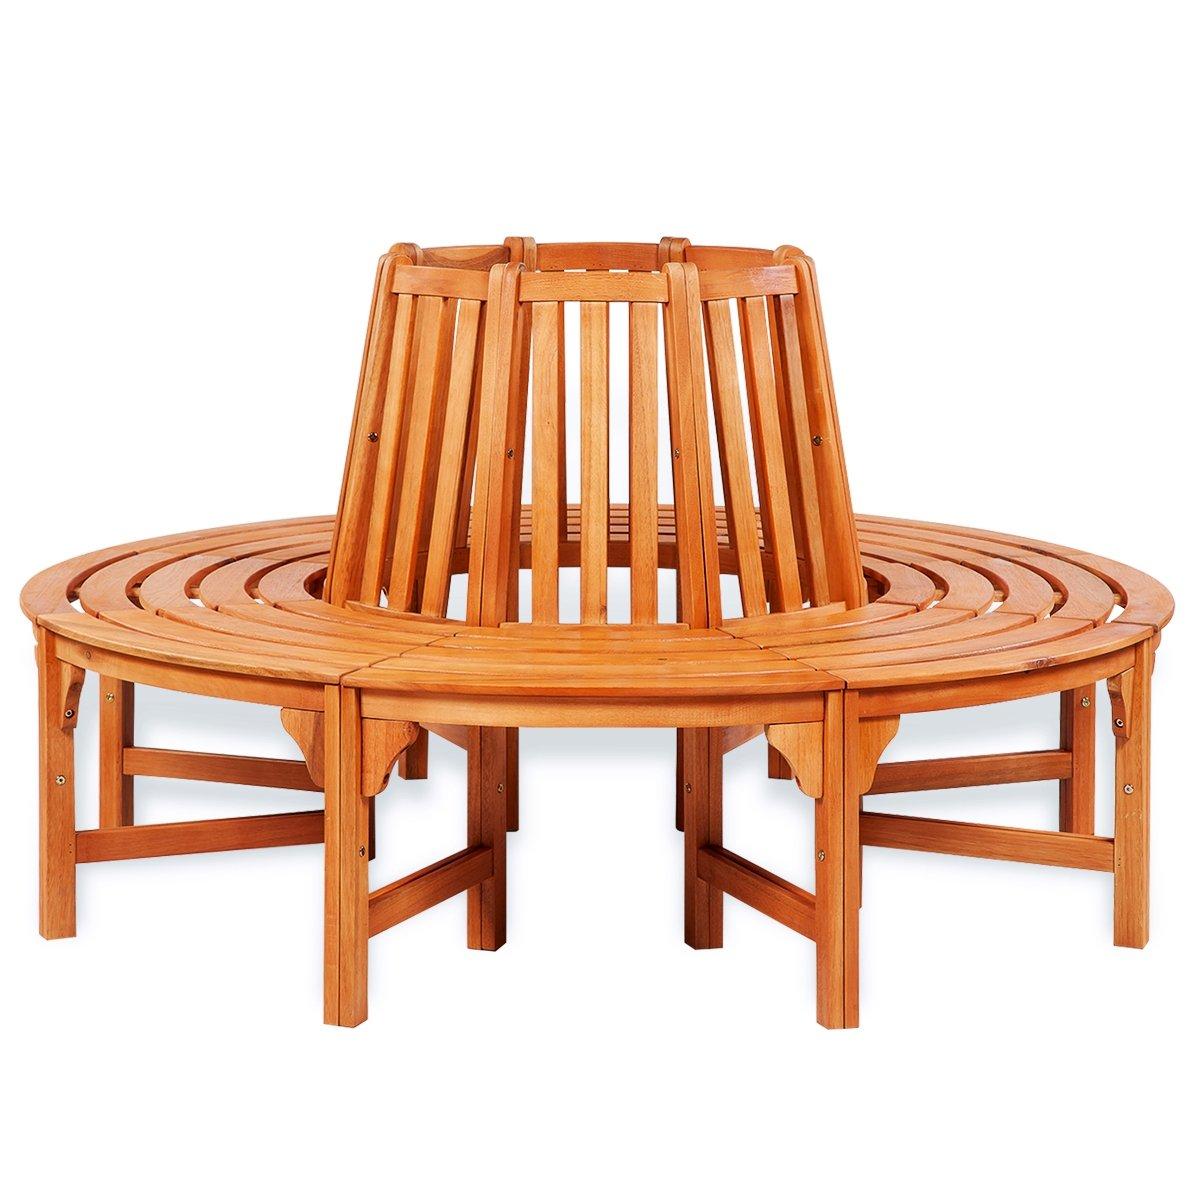 VidaXL Rundbank Baumbank Holzbank Gartenmöbel Sitzgruppe Gartenbank  Eukalyptus Hartholz Kaufen